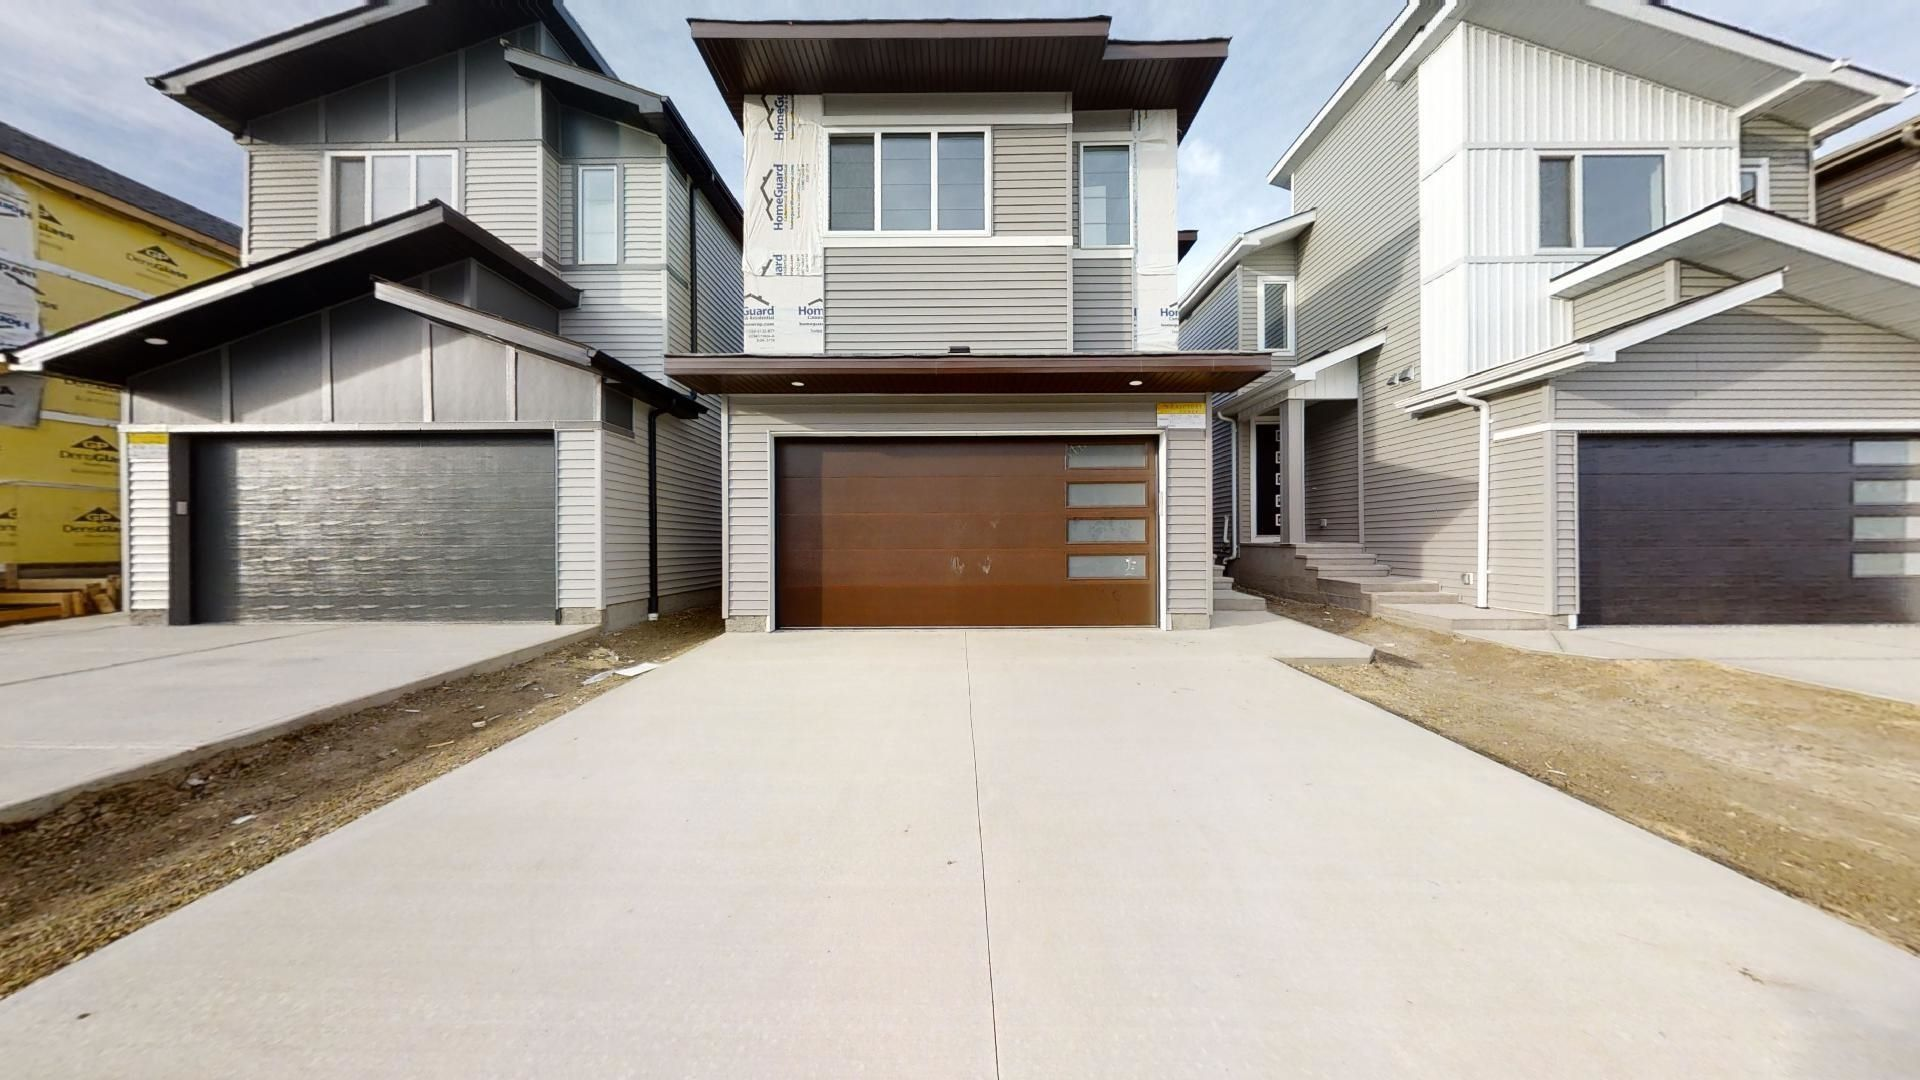 Main Photo: 19712 28 Avenue in Edmonton: Zone 57 House for sale : MLS®# E4263971